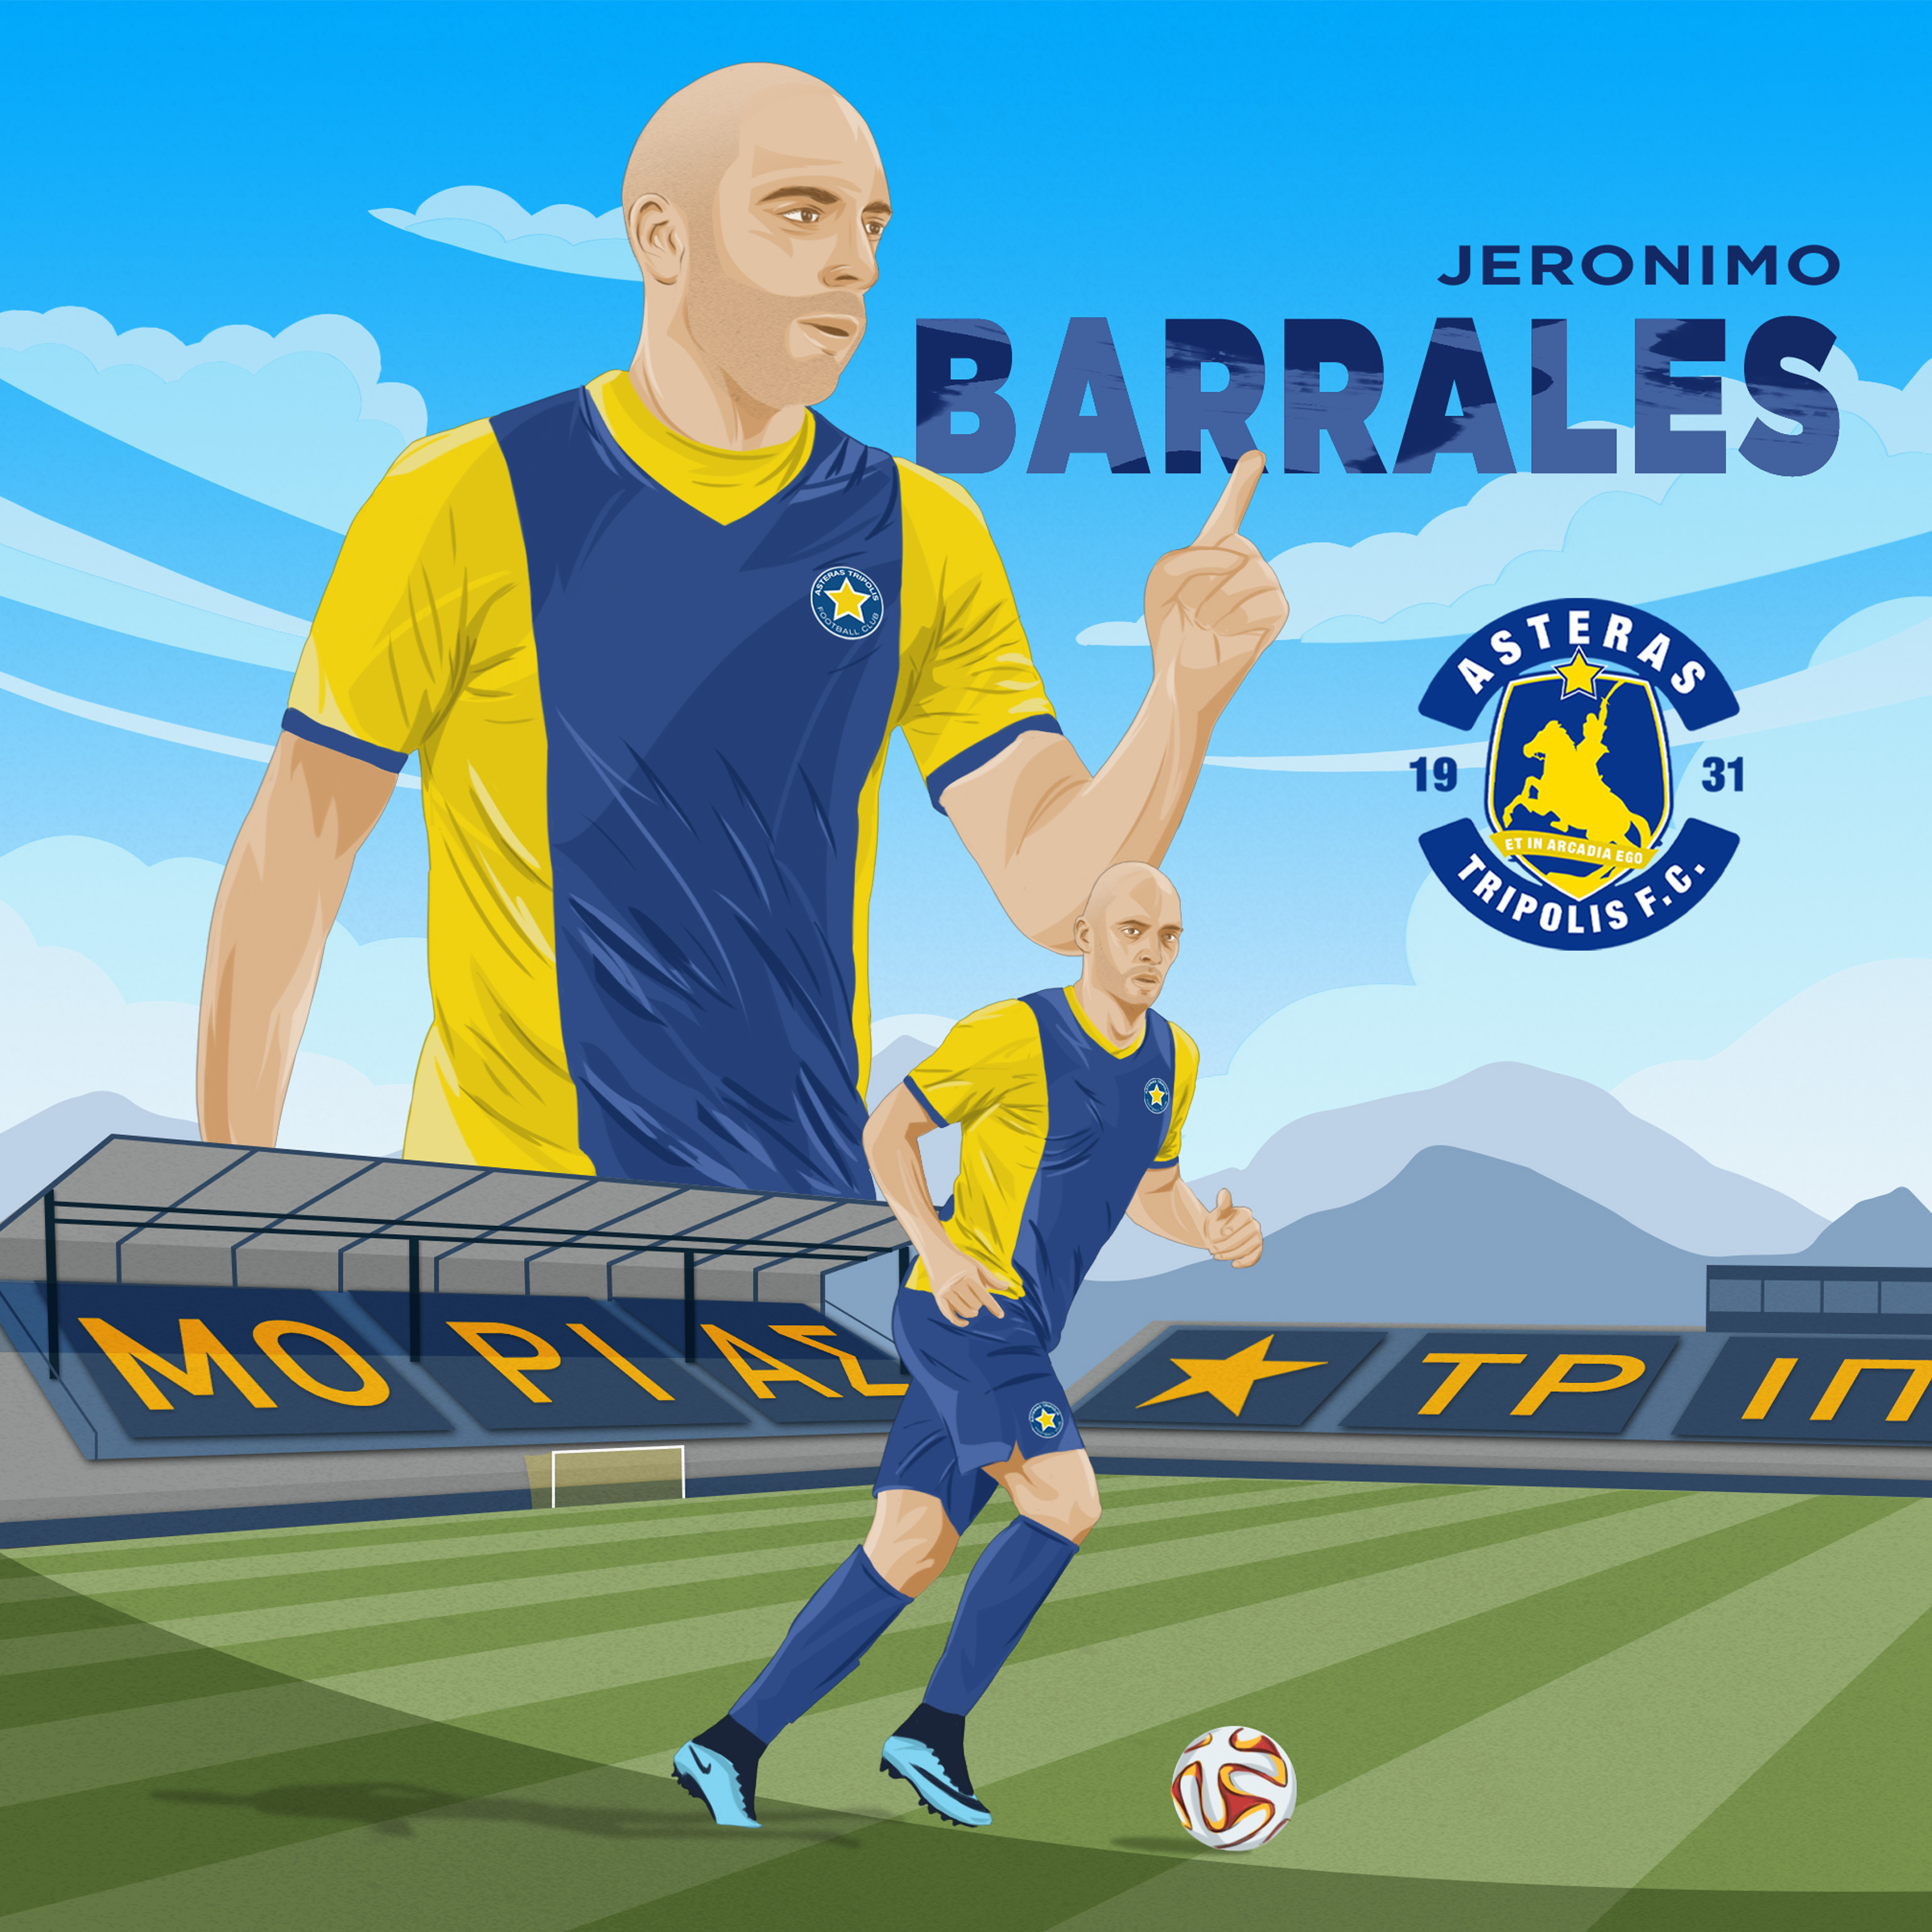 Jeronimo Barrales - Asteras Tripolis F.C. - Smado Animation